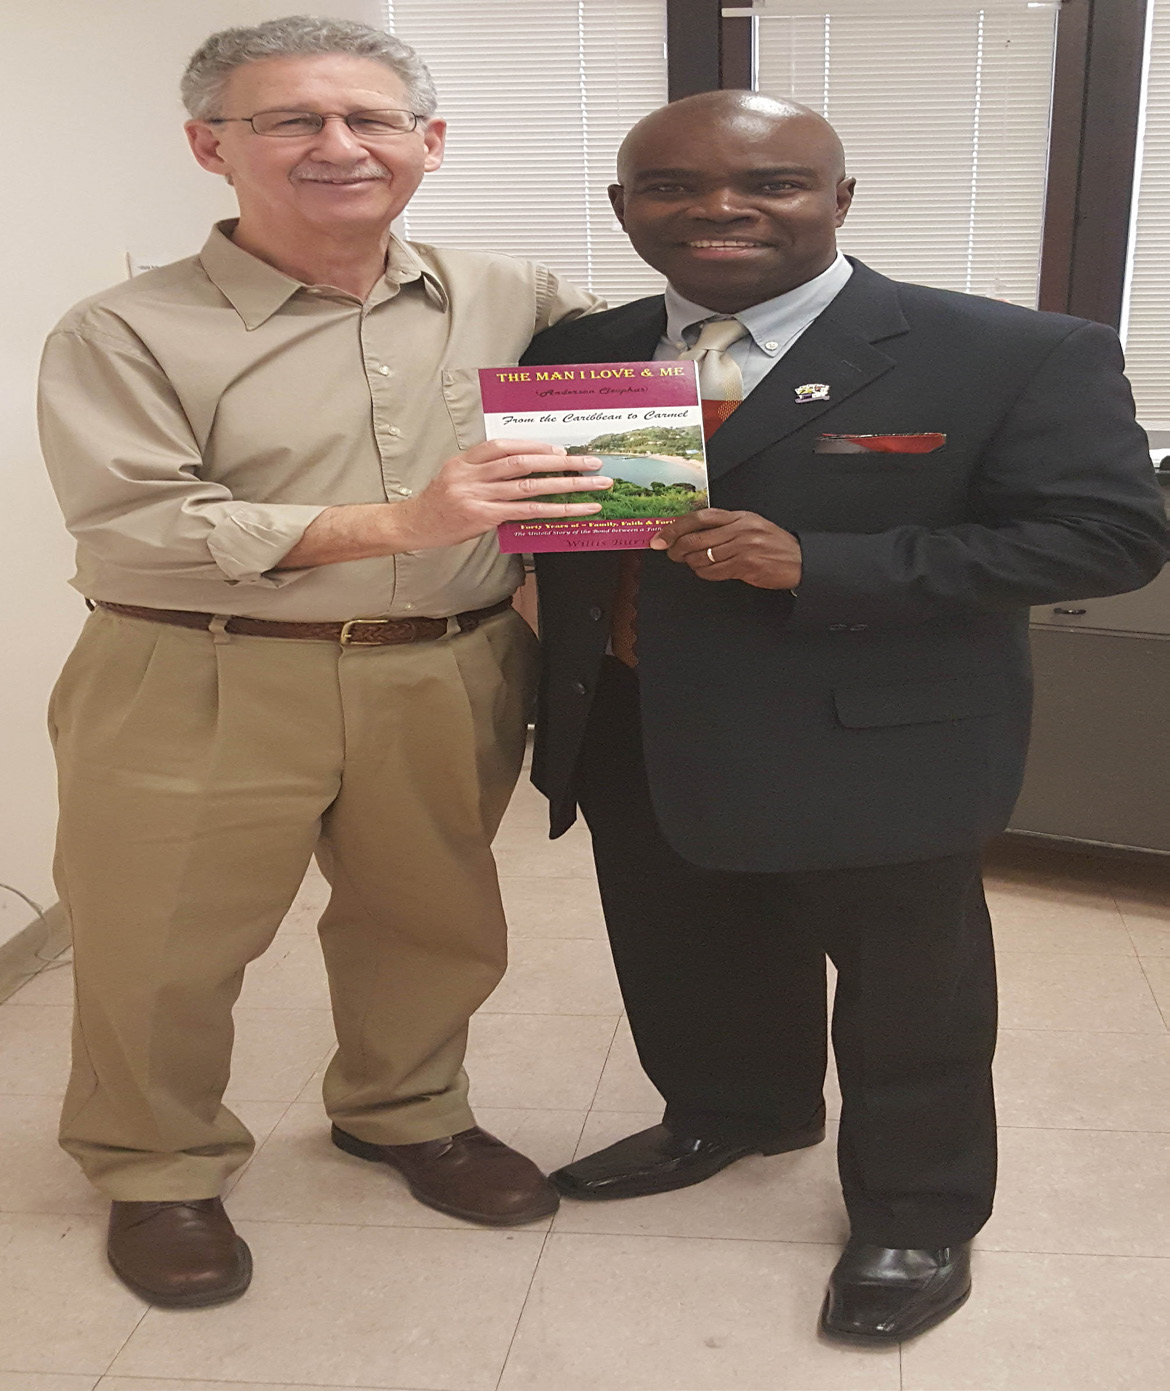 Professor Glenn Lewis with York Alum Willis Burris. PHOTO BY Bintia Drame